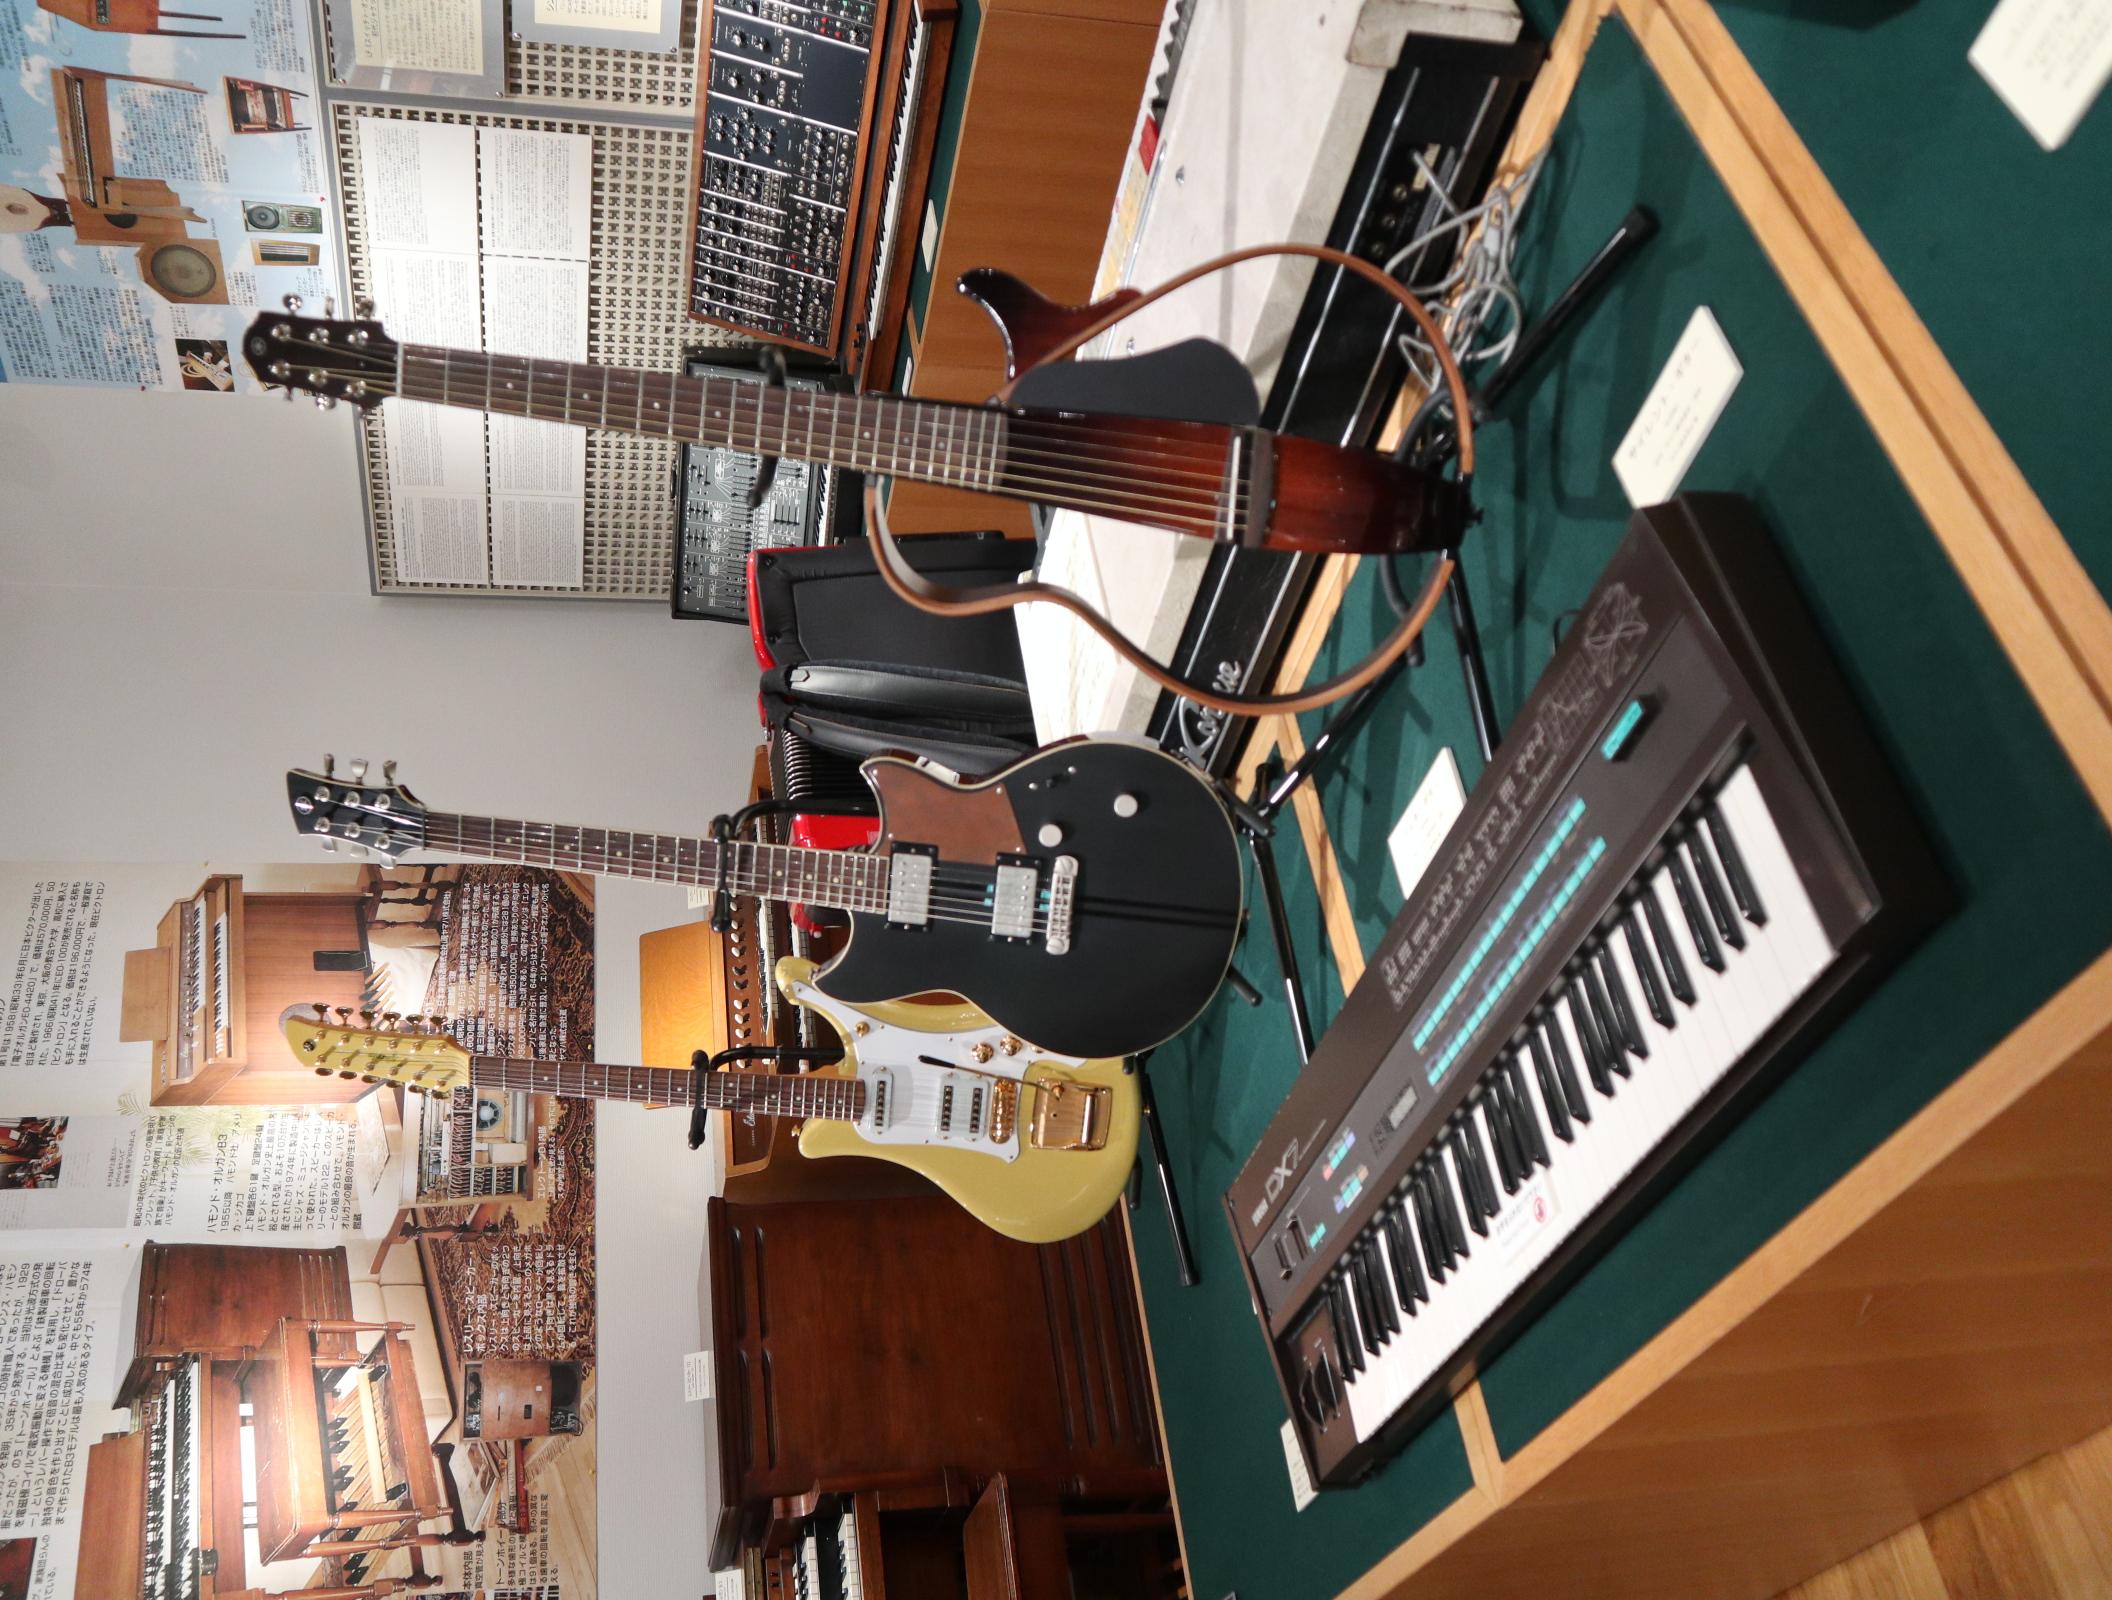 Yamaha Guitars and DX7